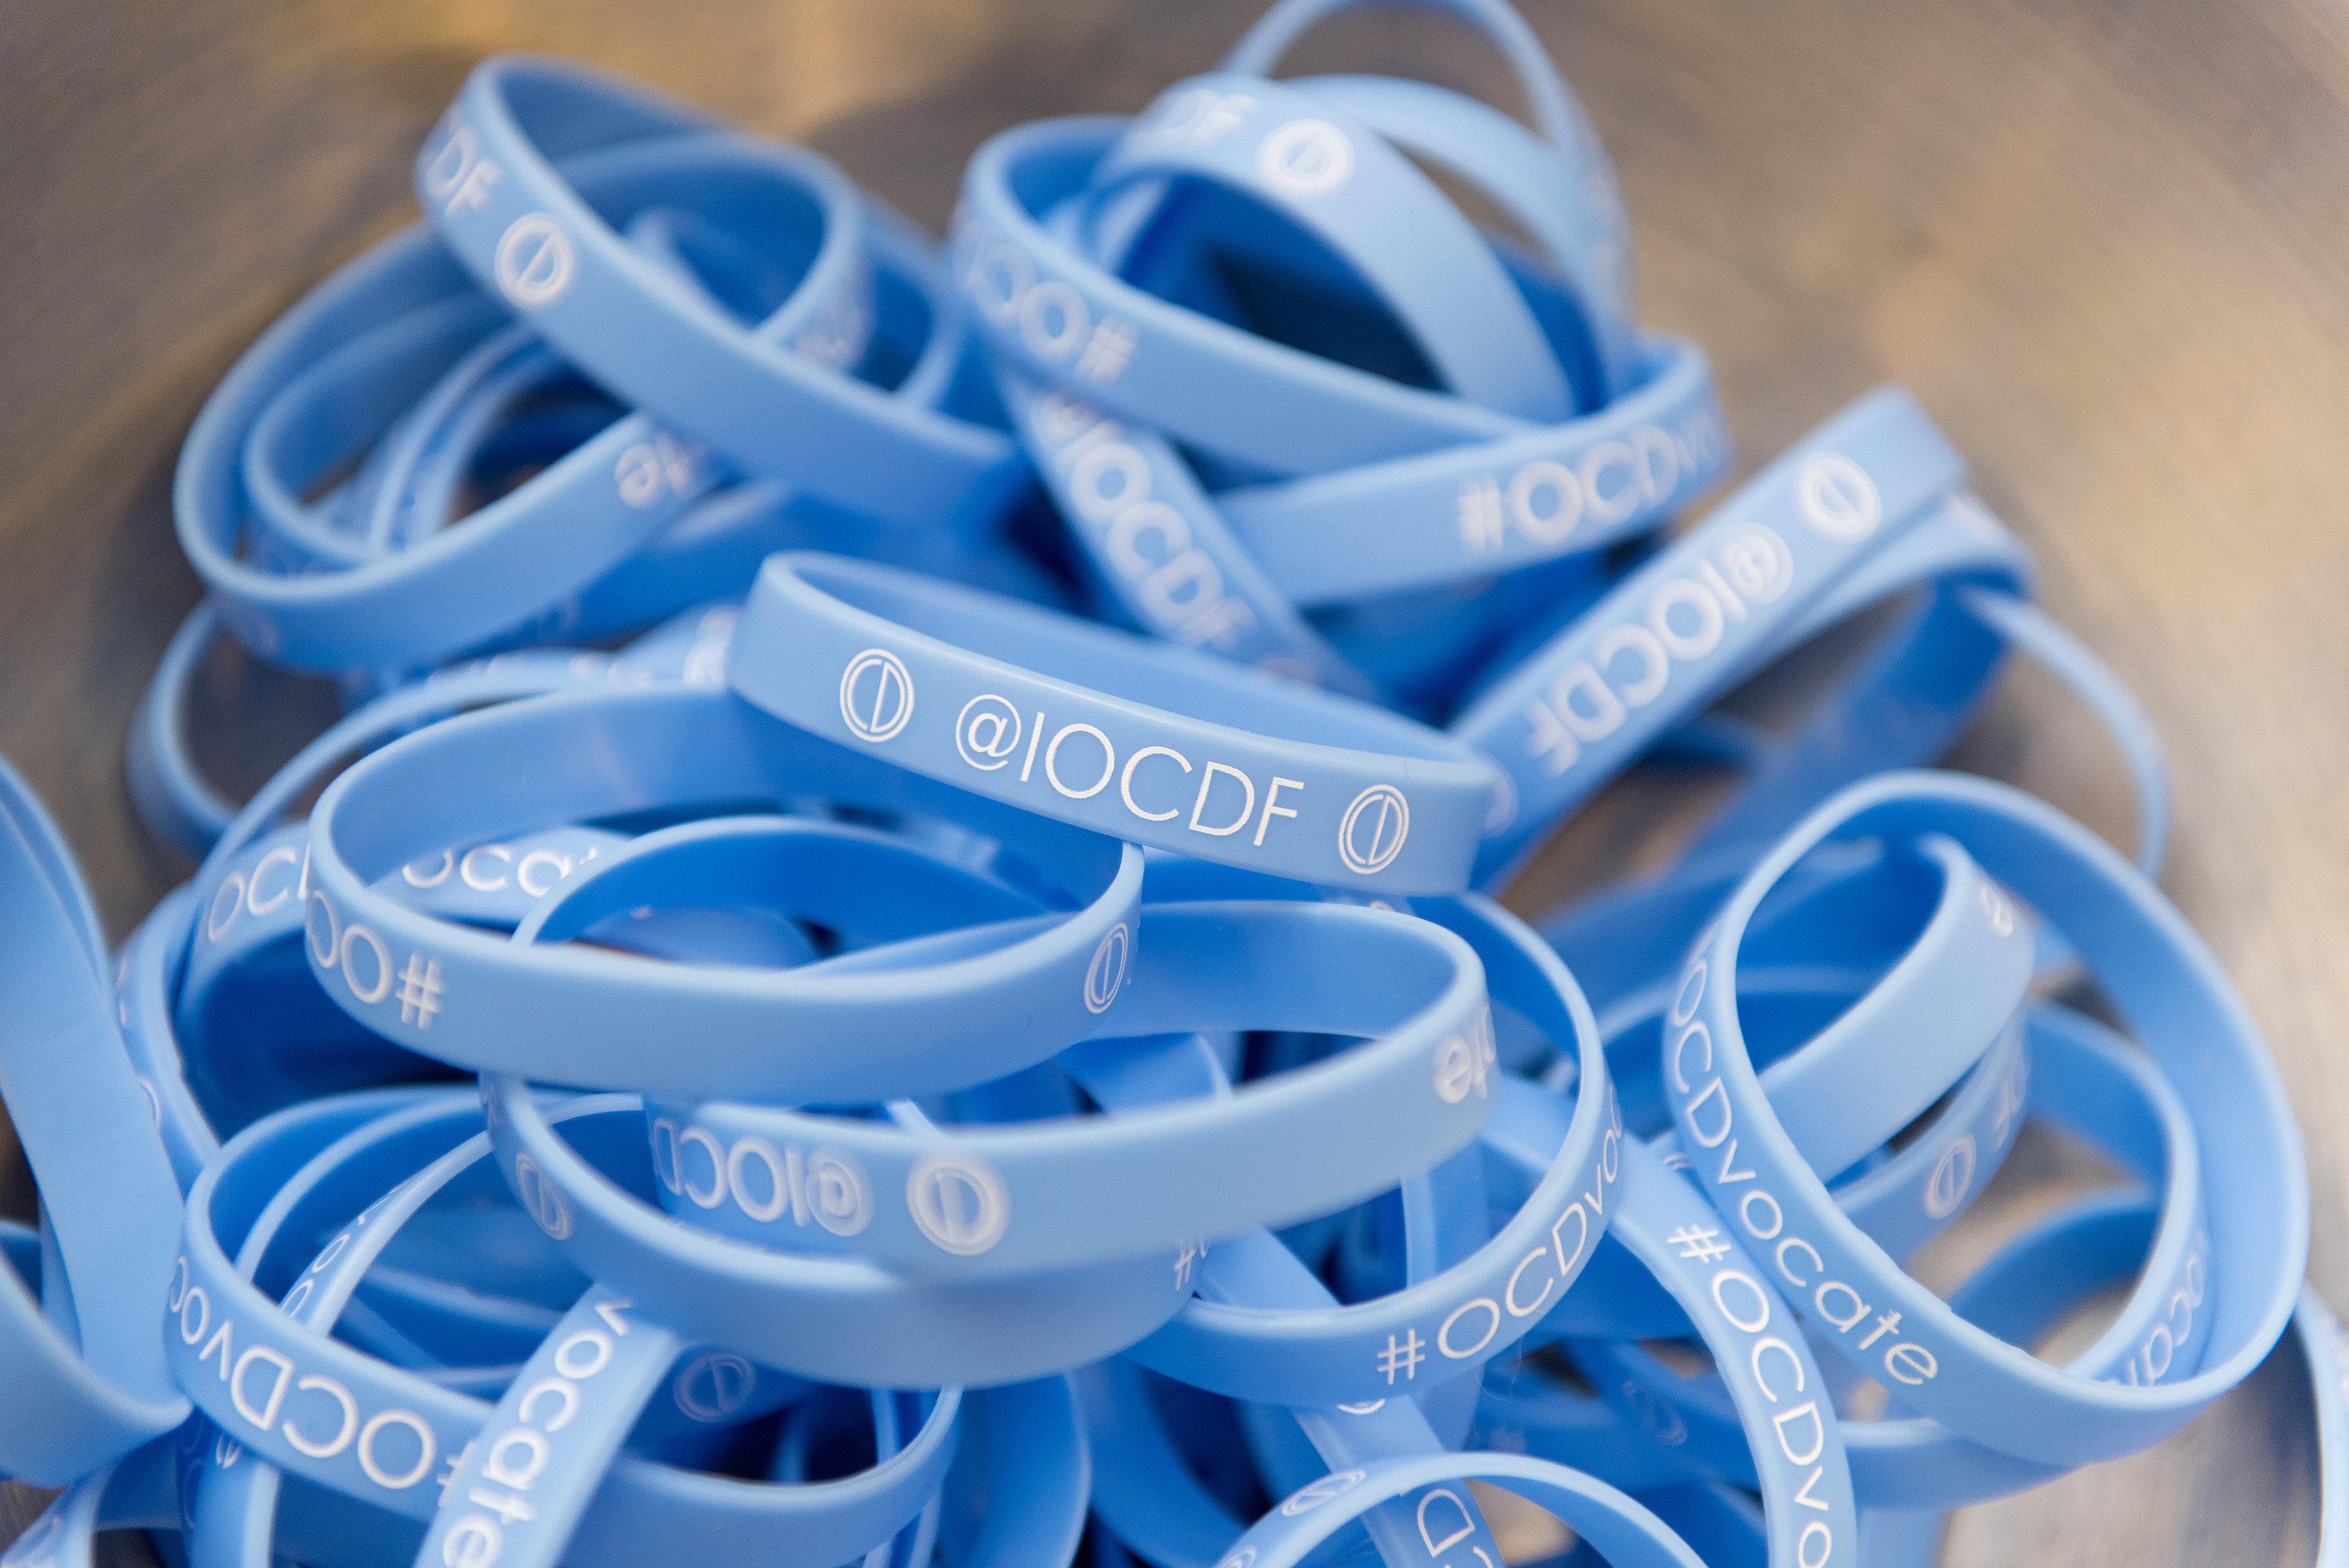 IOCDF Booth Bracelets